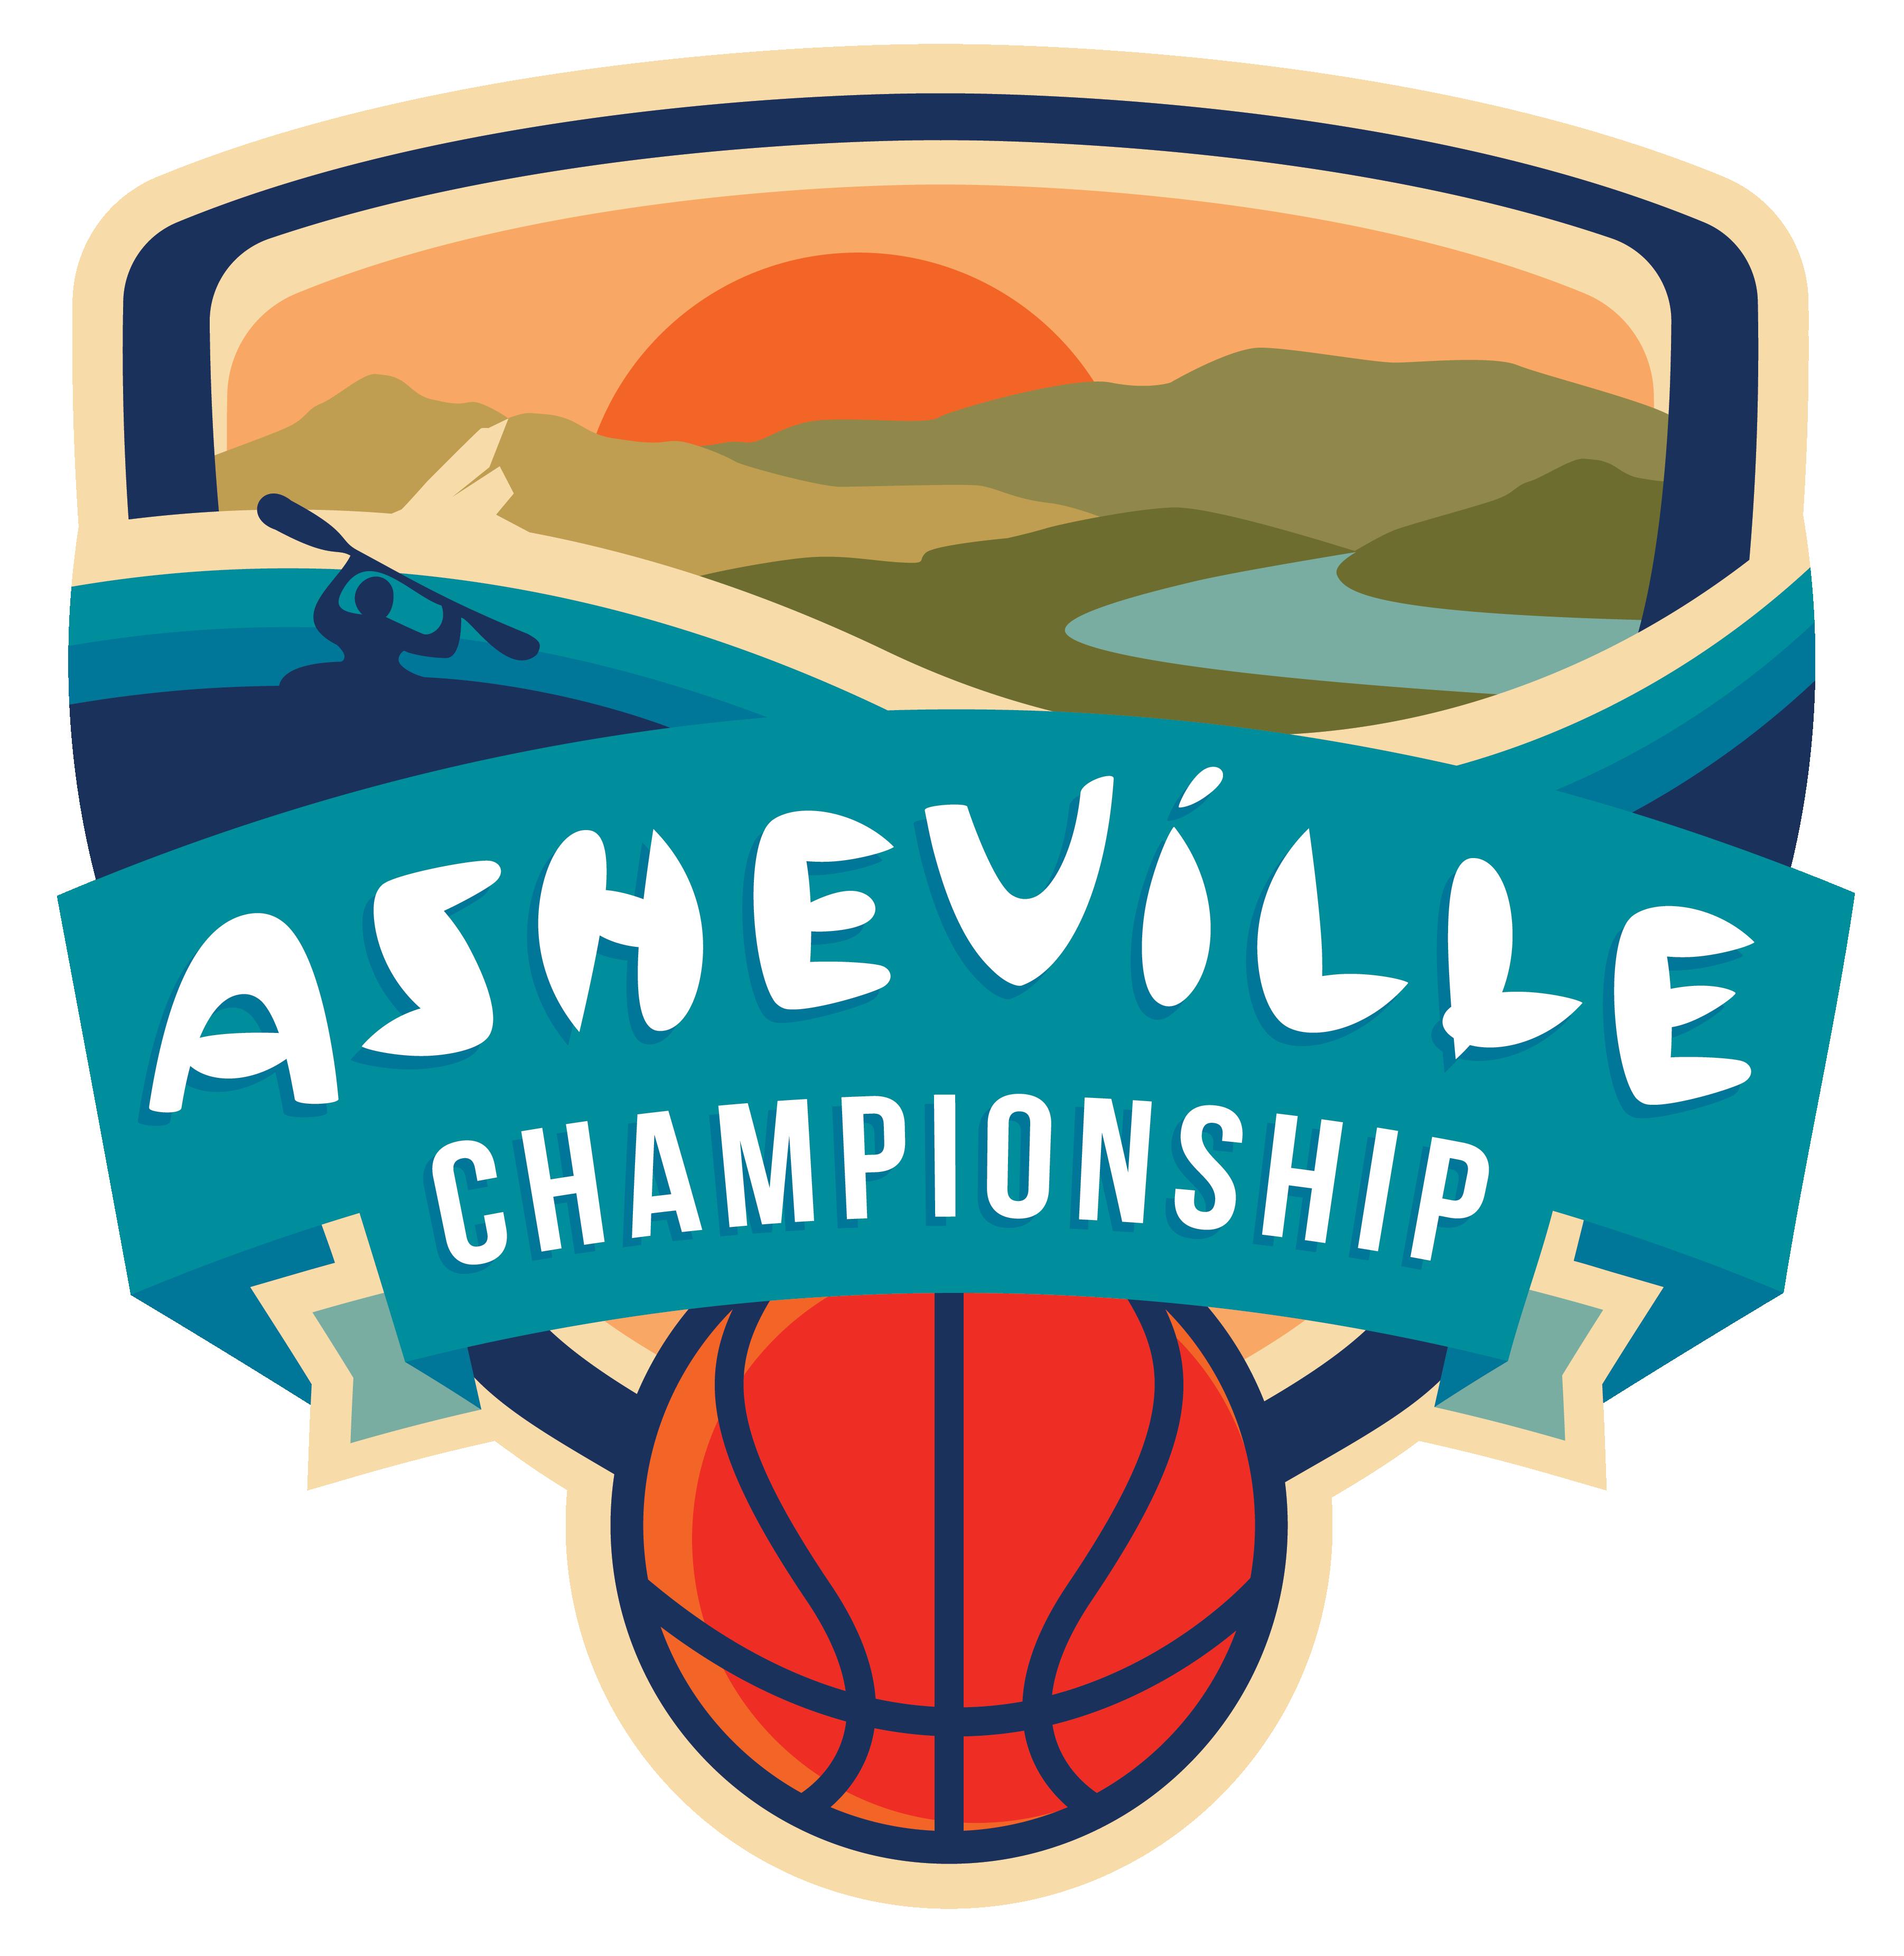 Asheville Championship